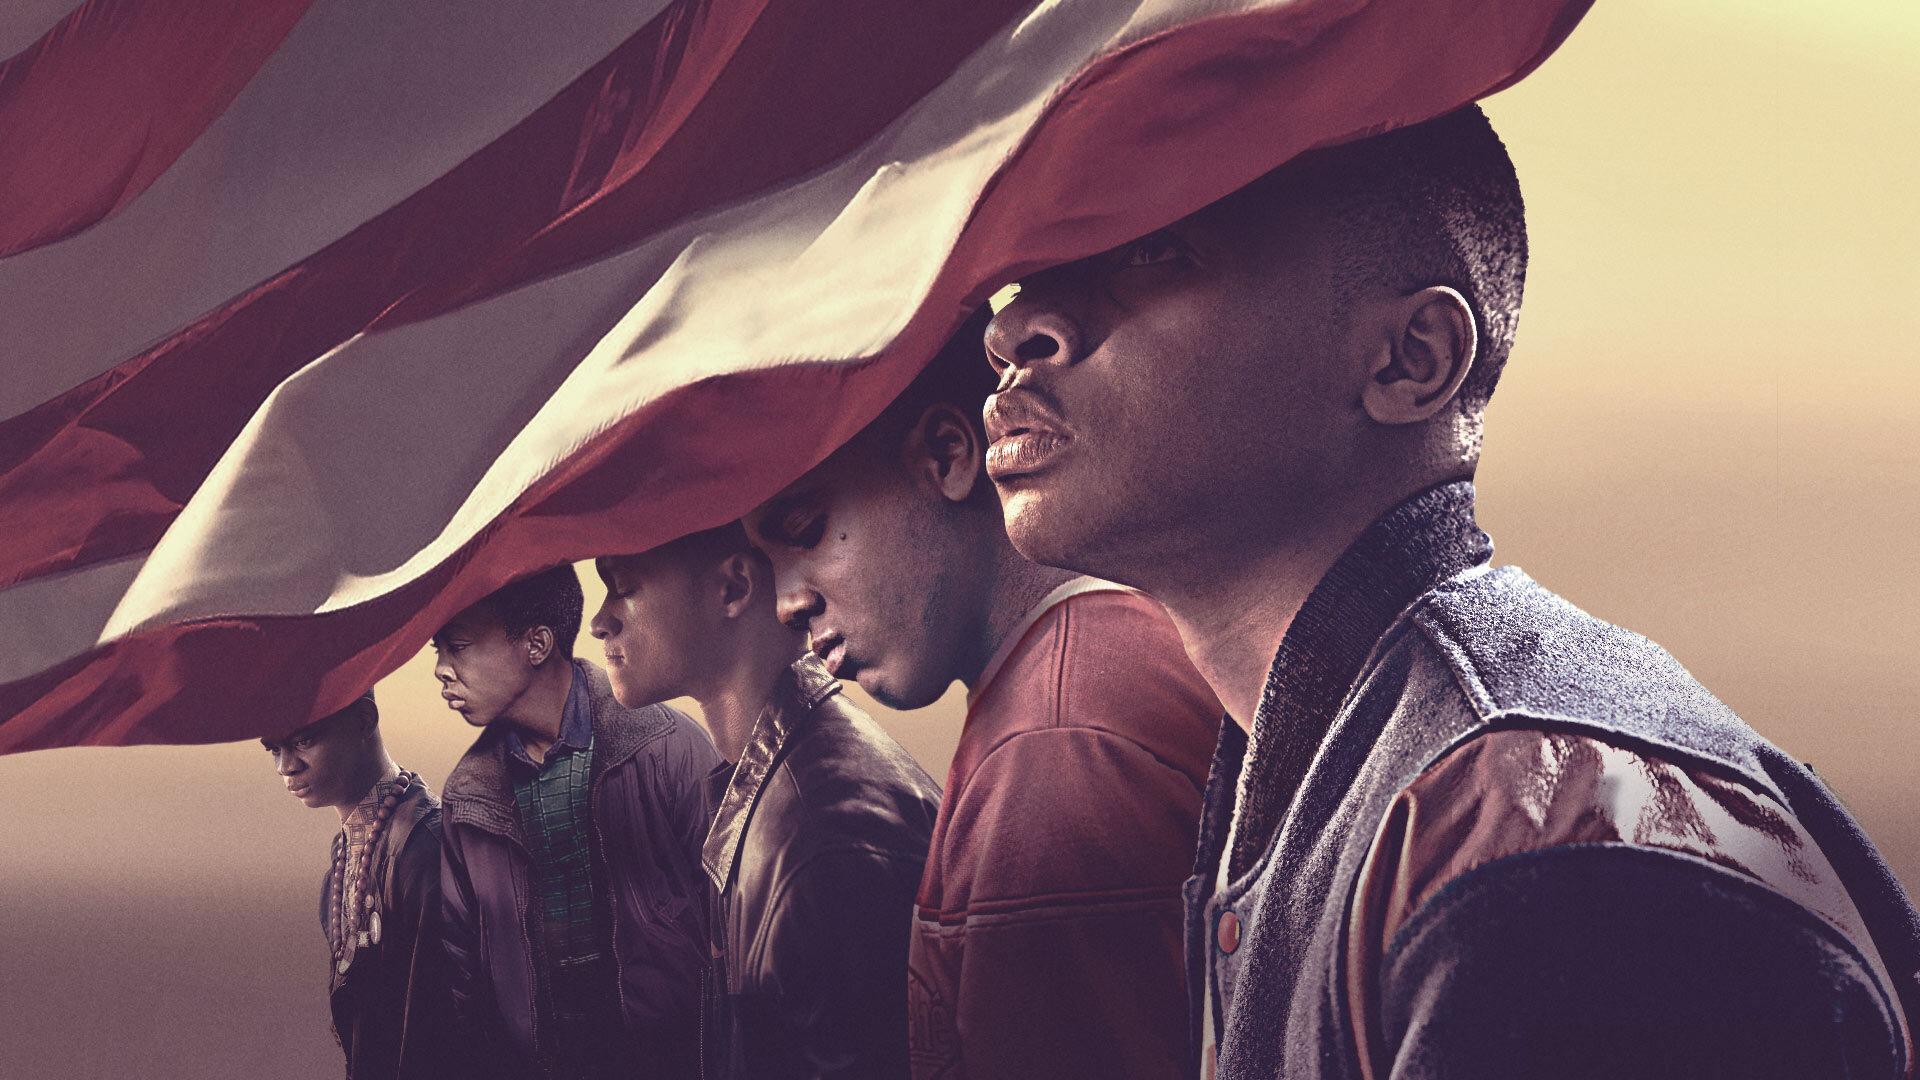 Netflix: Πως μπορείτε να δείτε δωρεάν ταινίες και σειρές